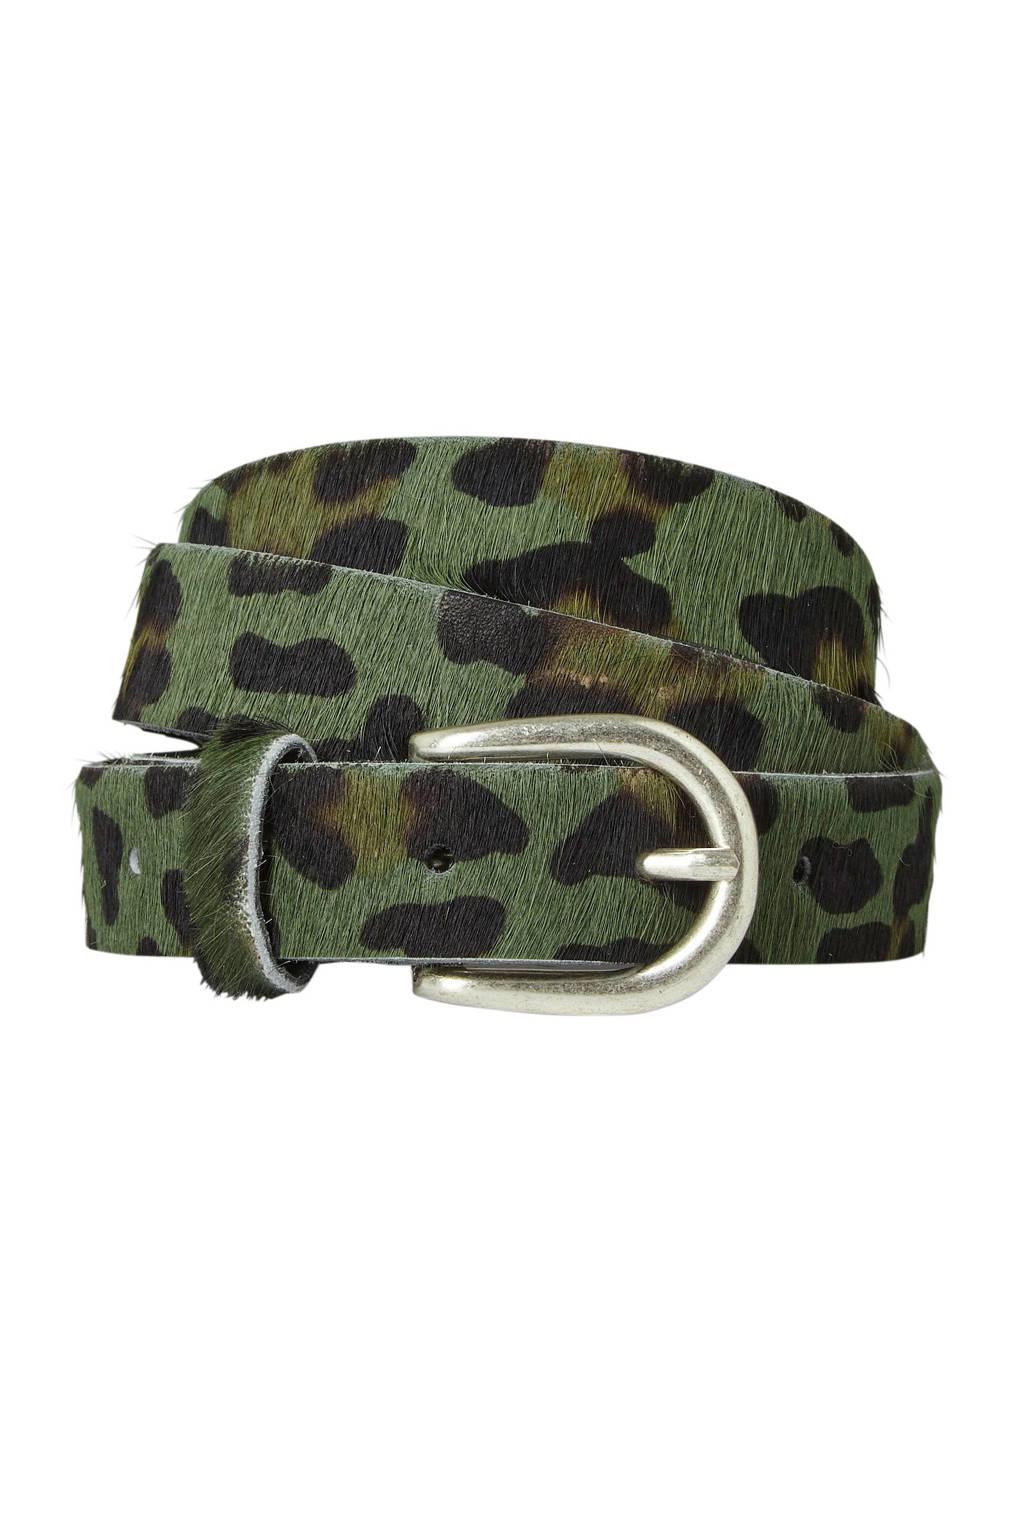 Cowboysbag Cowboysbelt riem met camouflage print, Groen/zwart/bruin